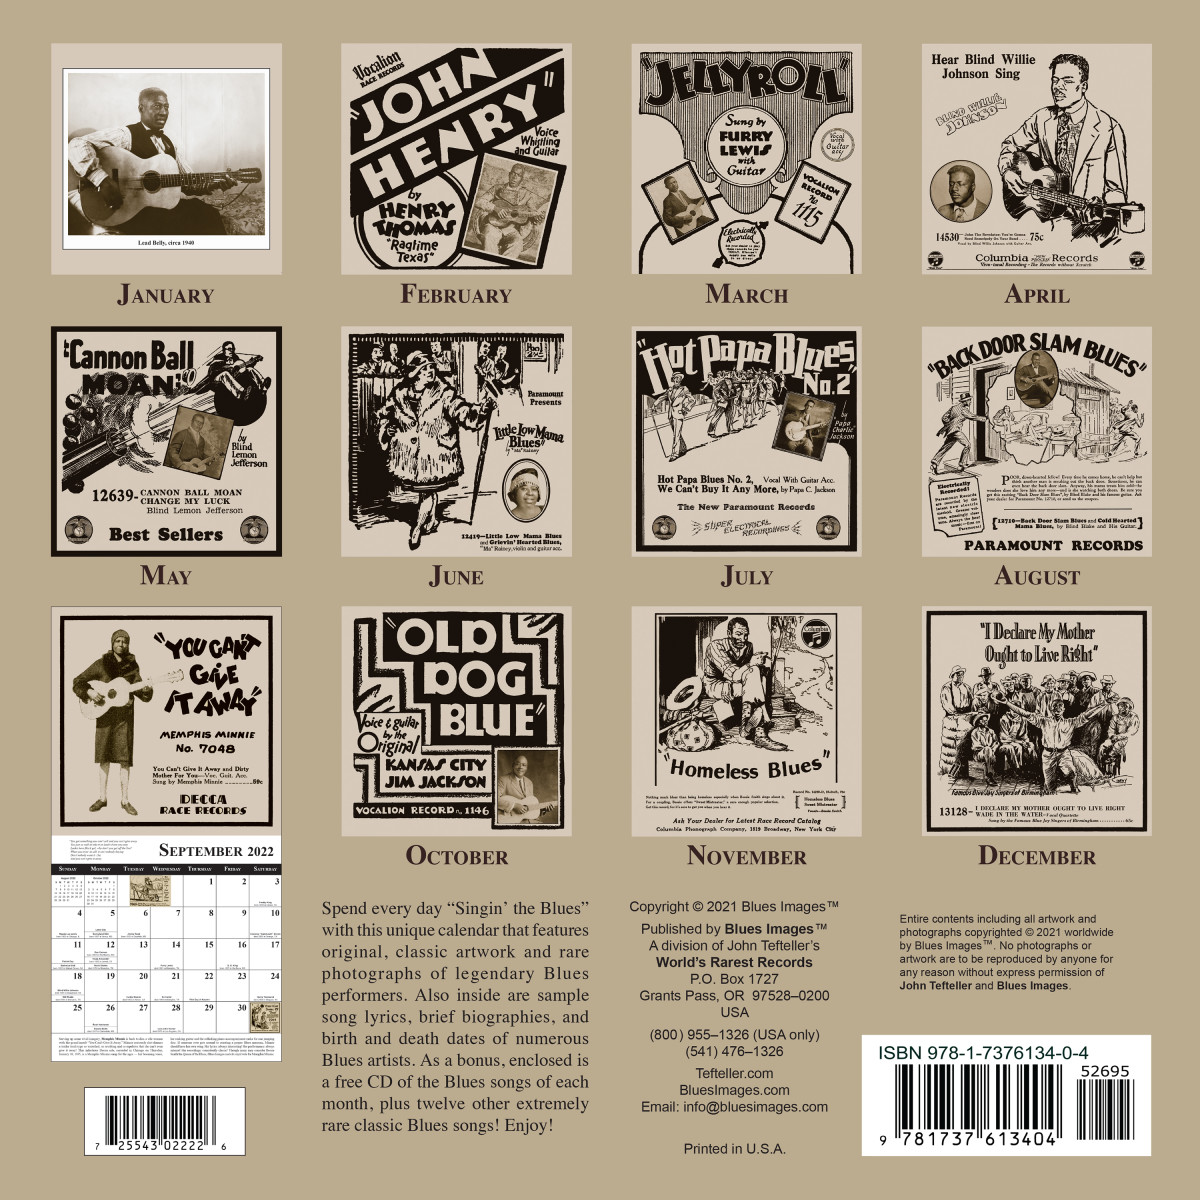 Blues Images 2022 Calendar back cover (300 dpi, 10x10)